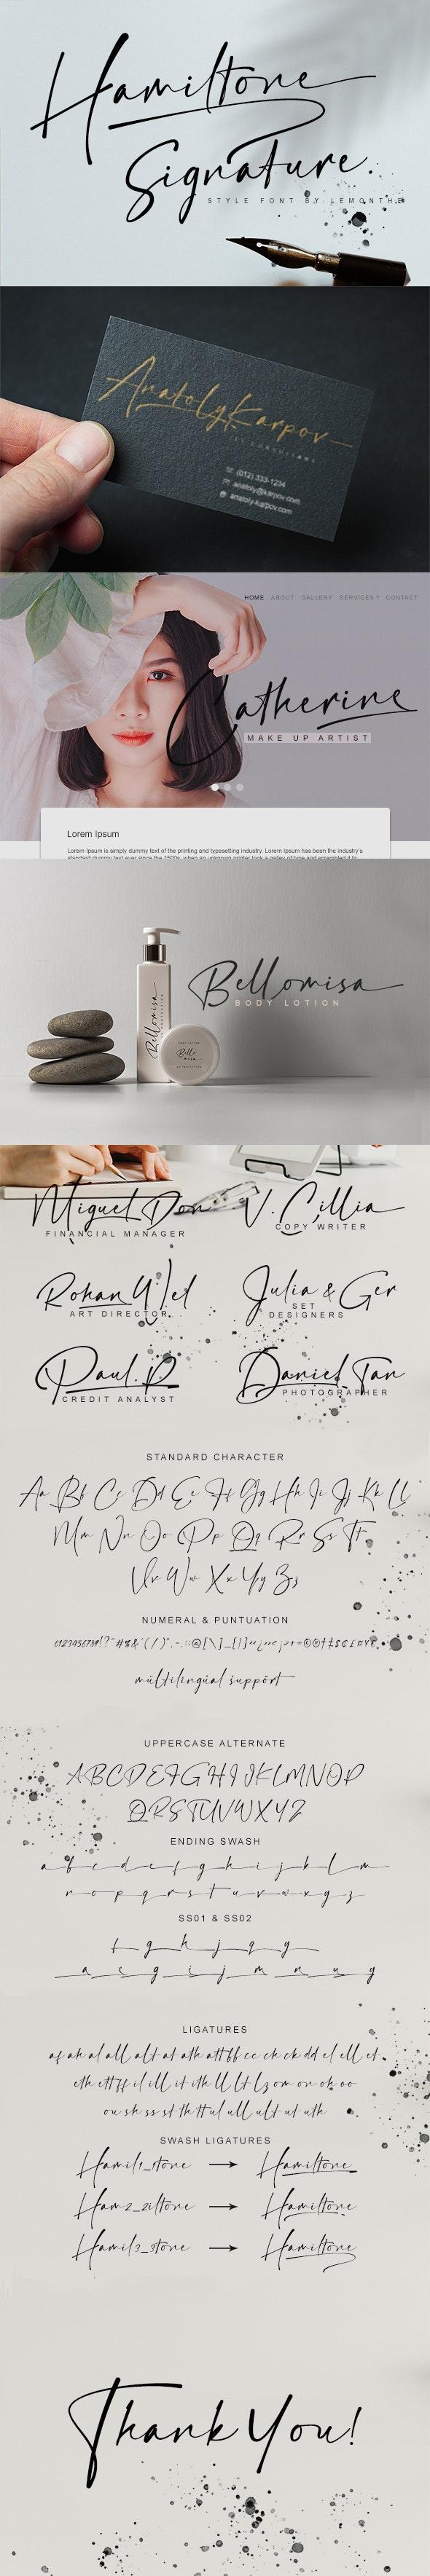 Hamiltone | Signature Font - Calligraphy Script